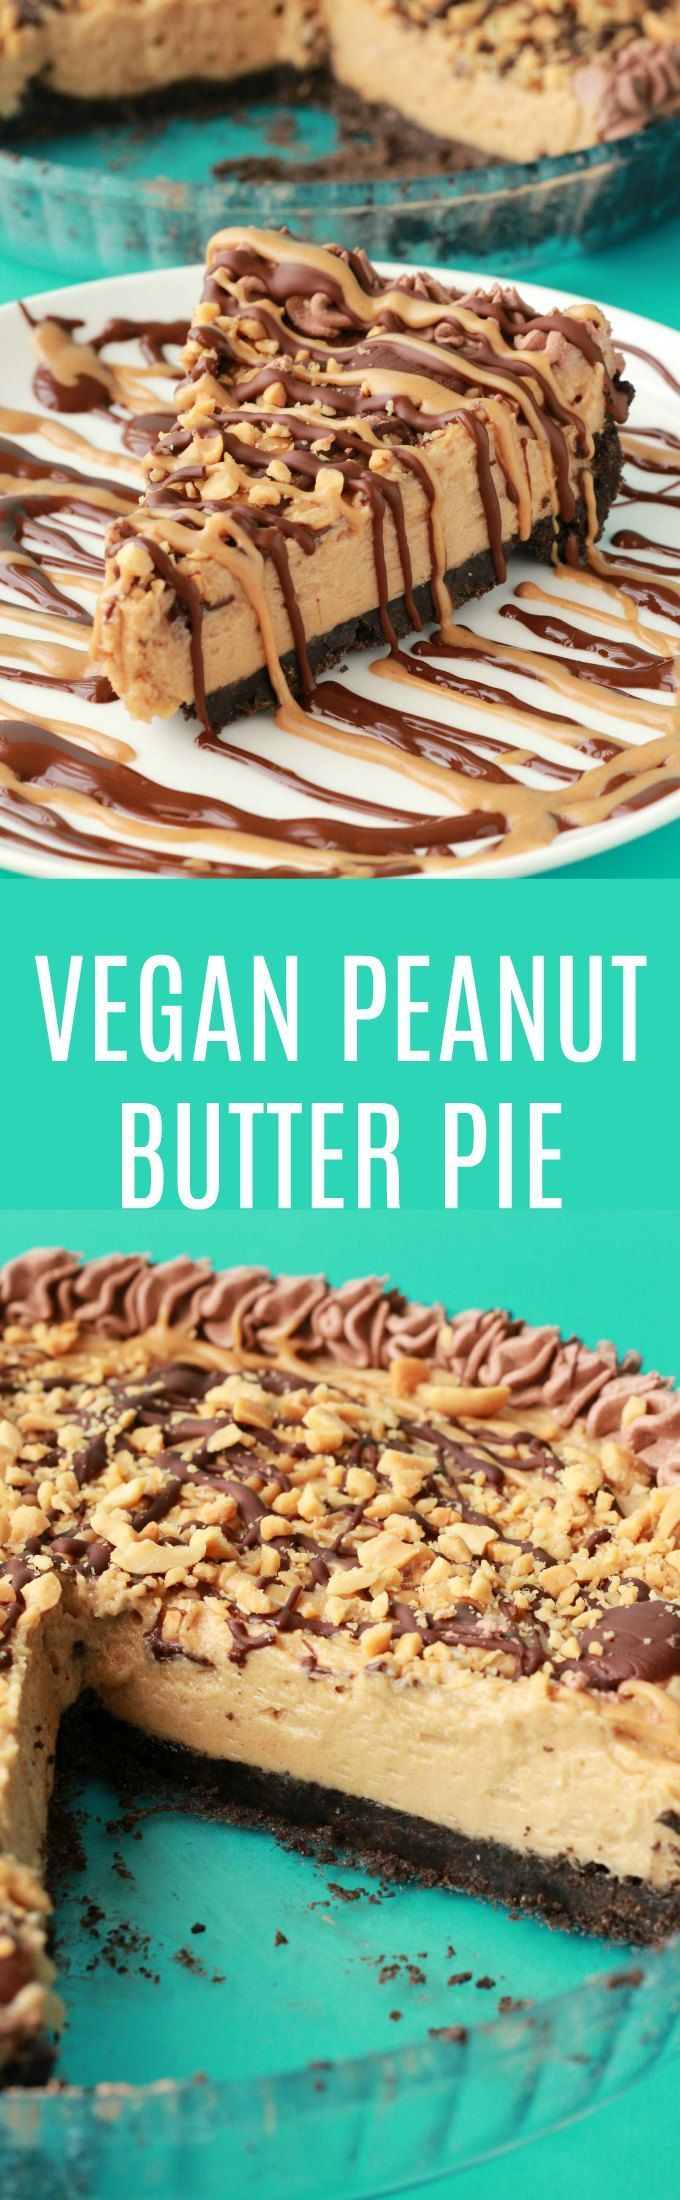 Vegan Peanut Butter Pie. Purely irresistible no-bake vegan pie with an oreo cookie crust, creamy peanut butter filling and drizzled peanut butter and chocolate topping! Vegan | Vegan Dessert | Vegan Pie | Vegan Recipes | Dairy Free